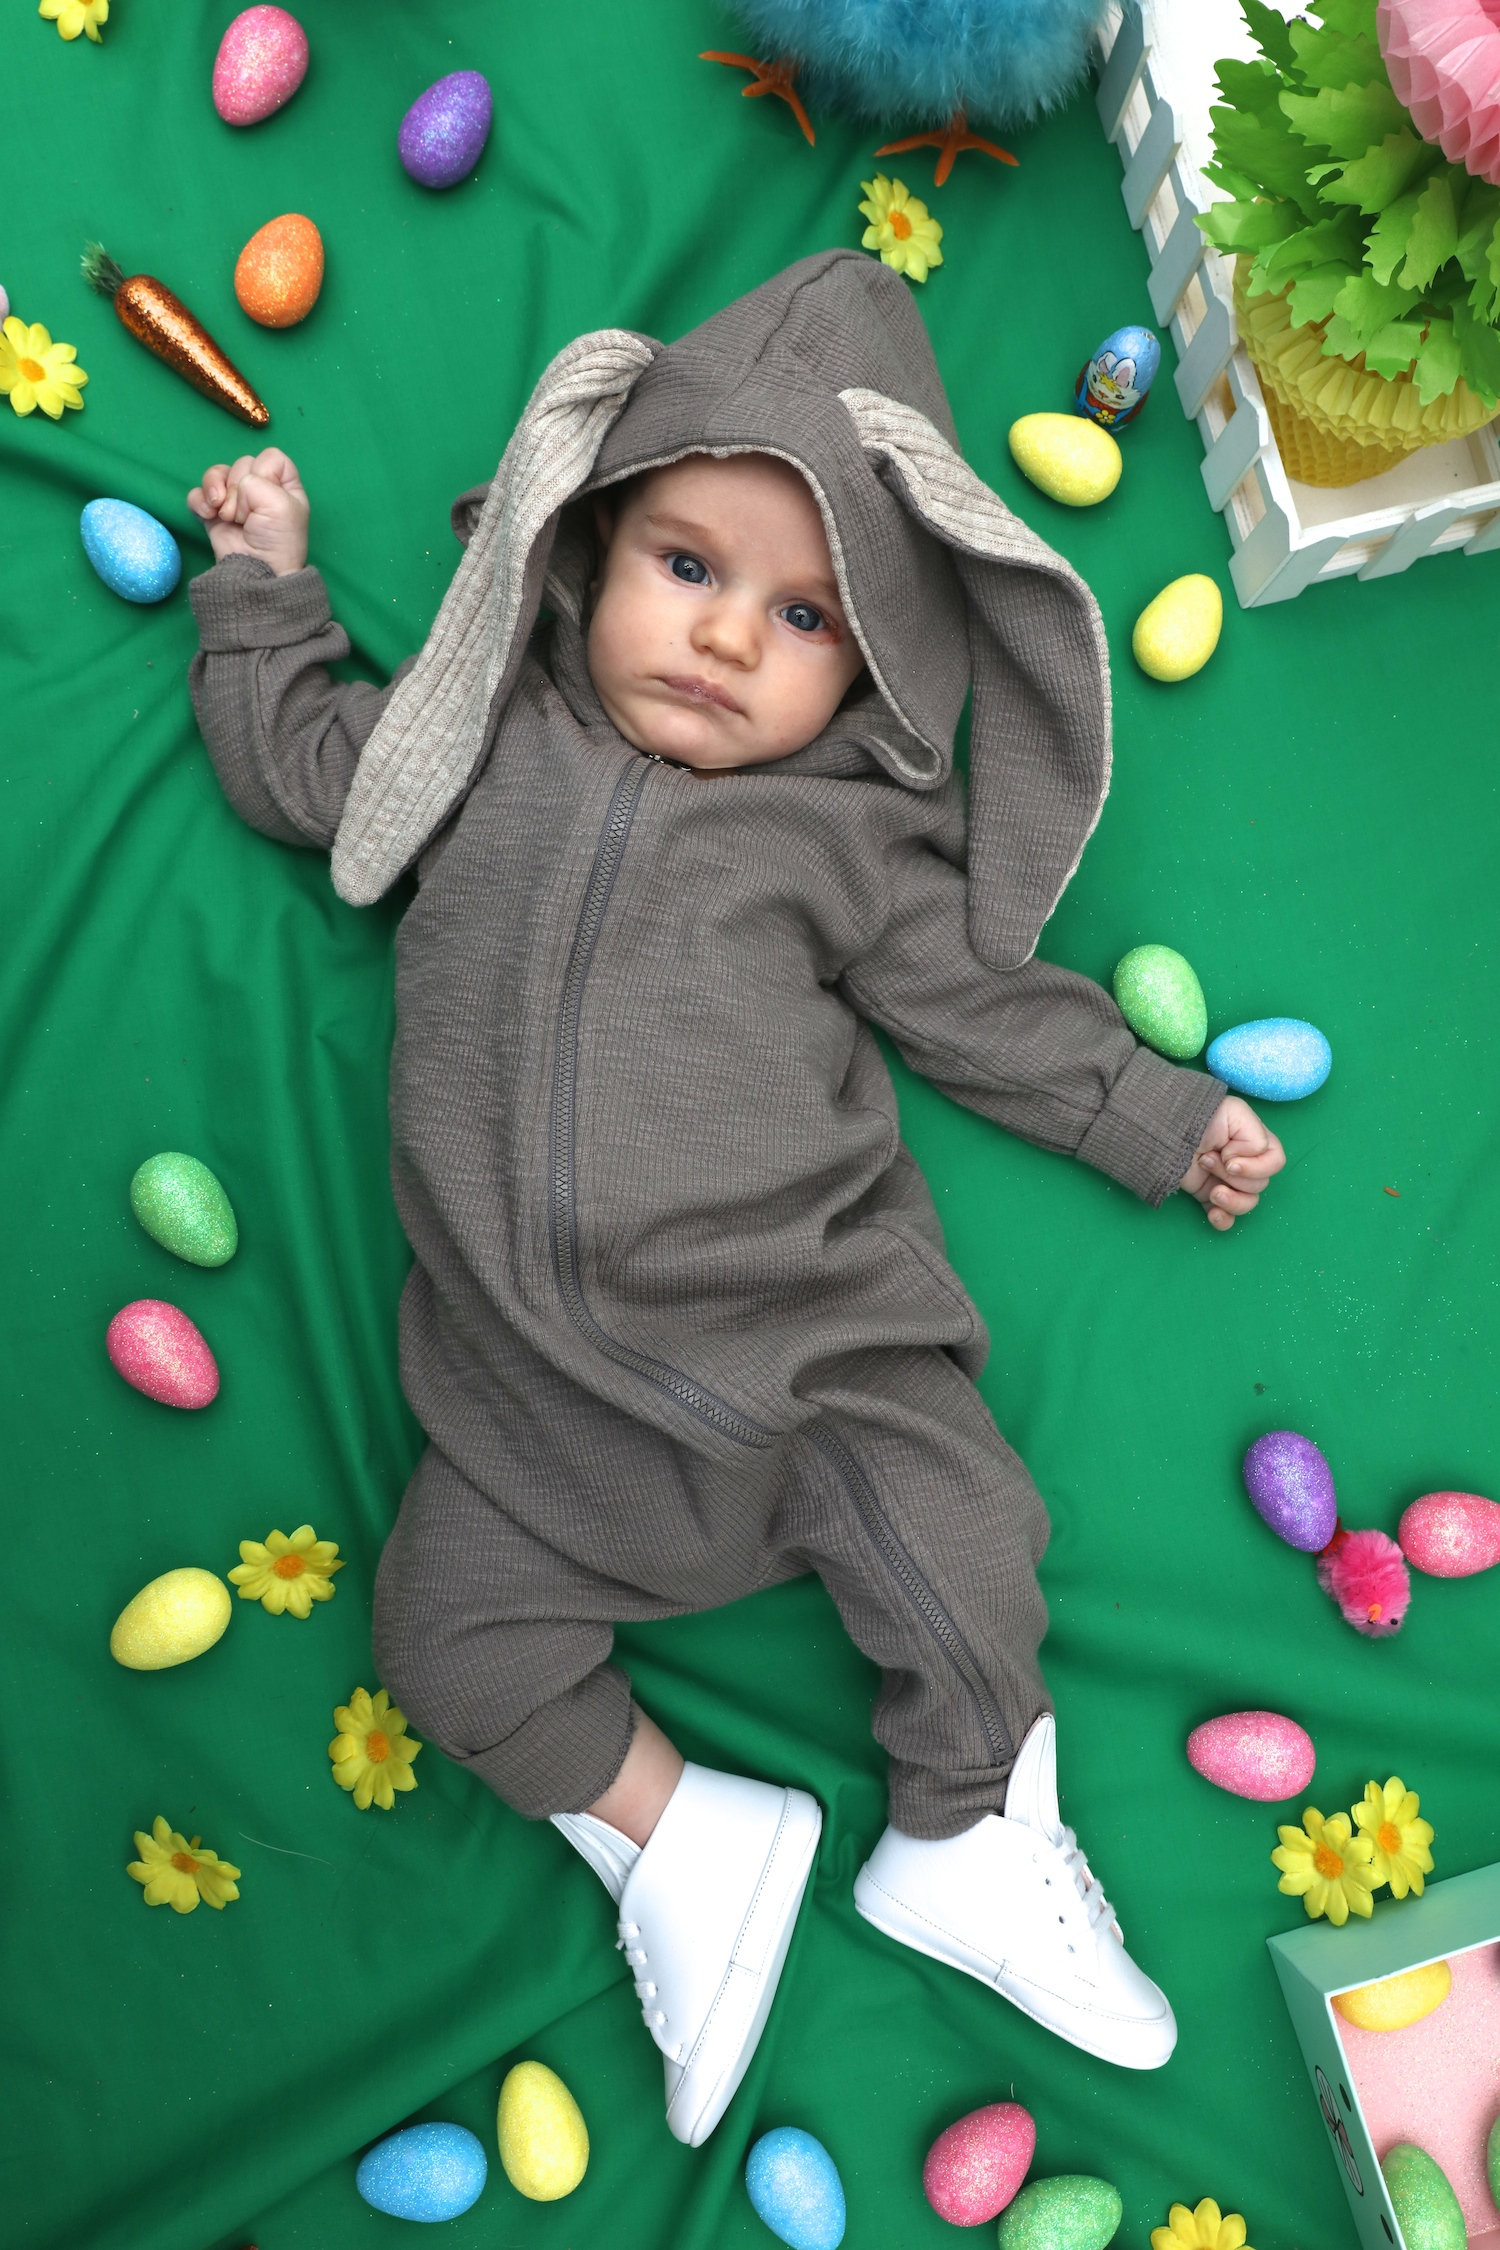 minna_parikka_bunny_trainers_easter_baby